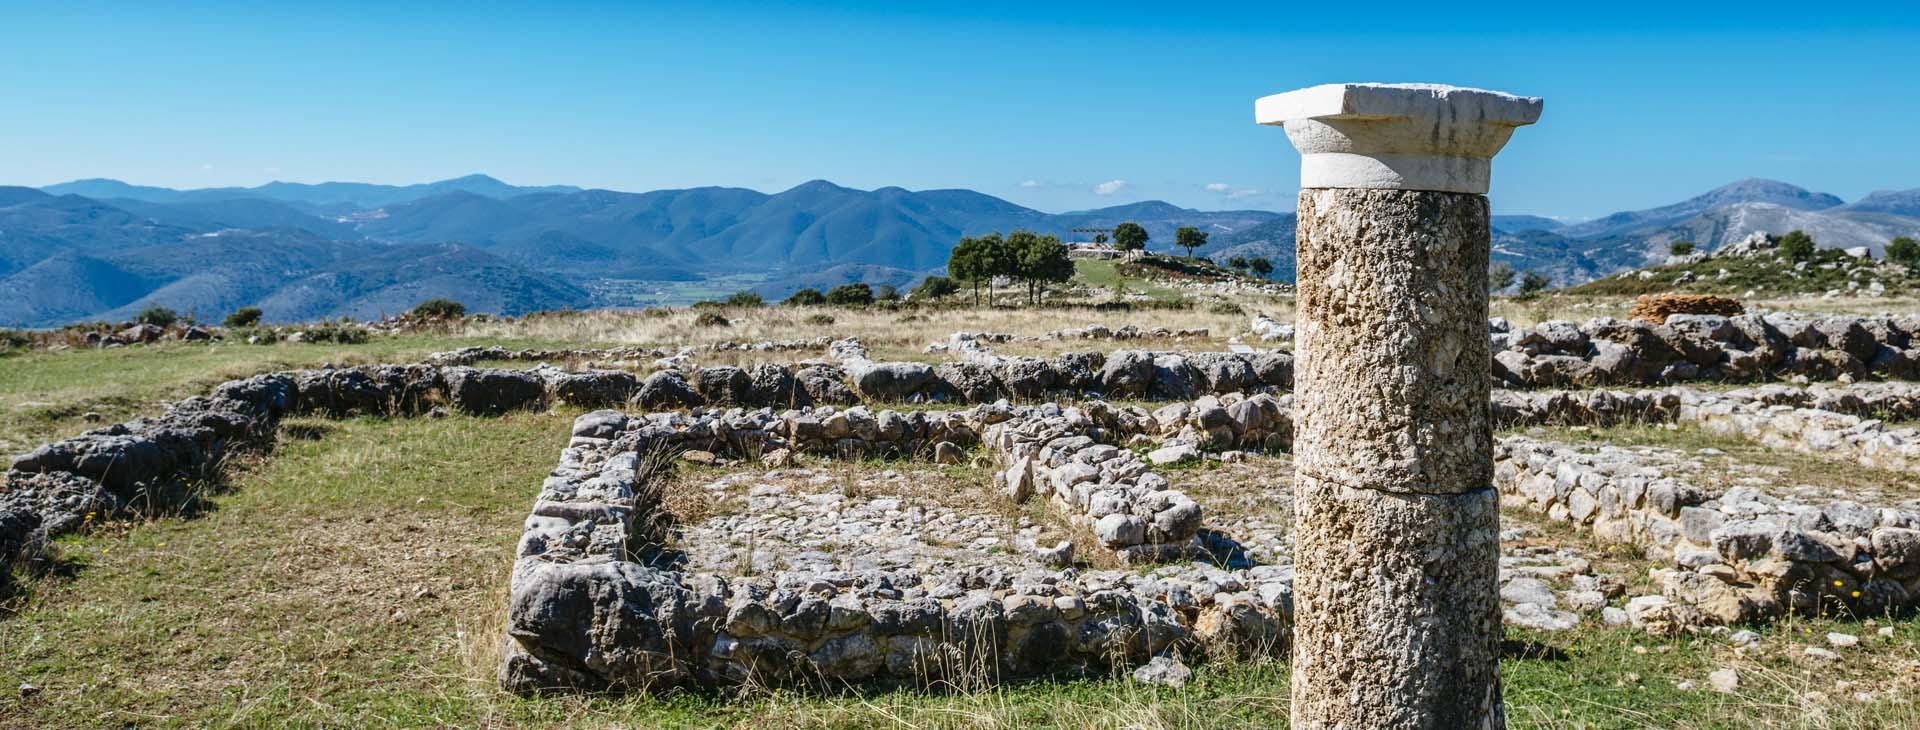 Archaeological site of Elea, Thesprotia